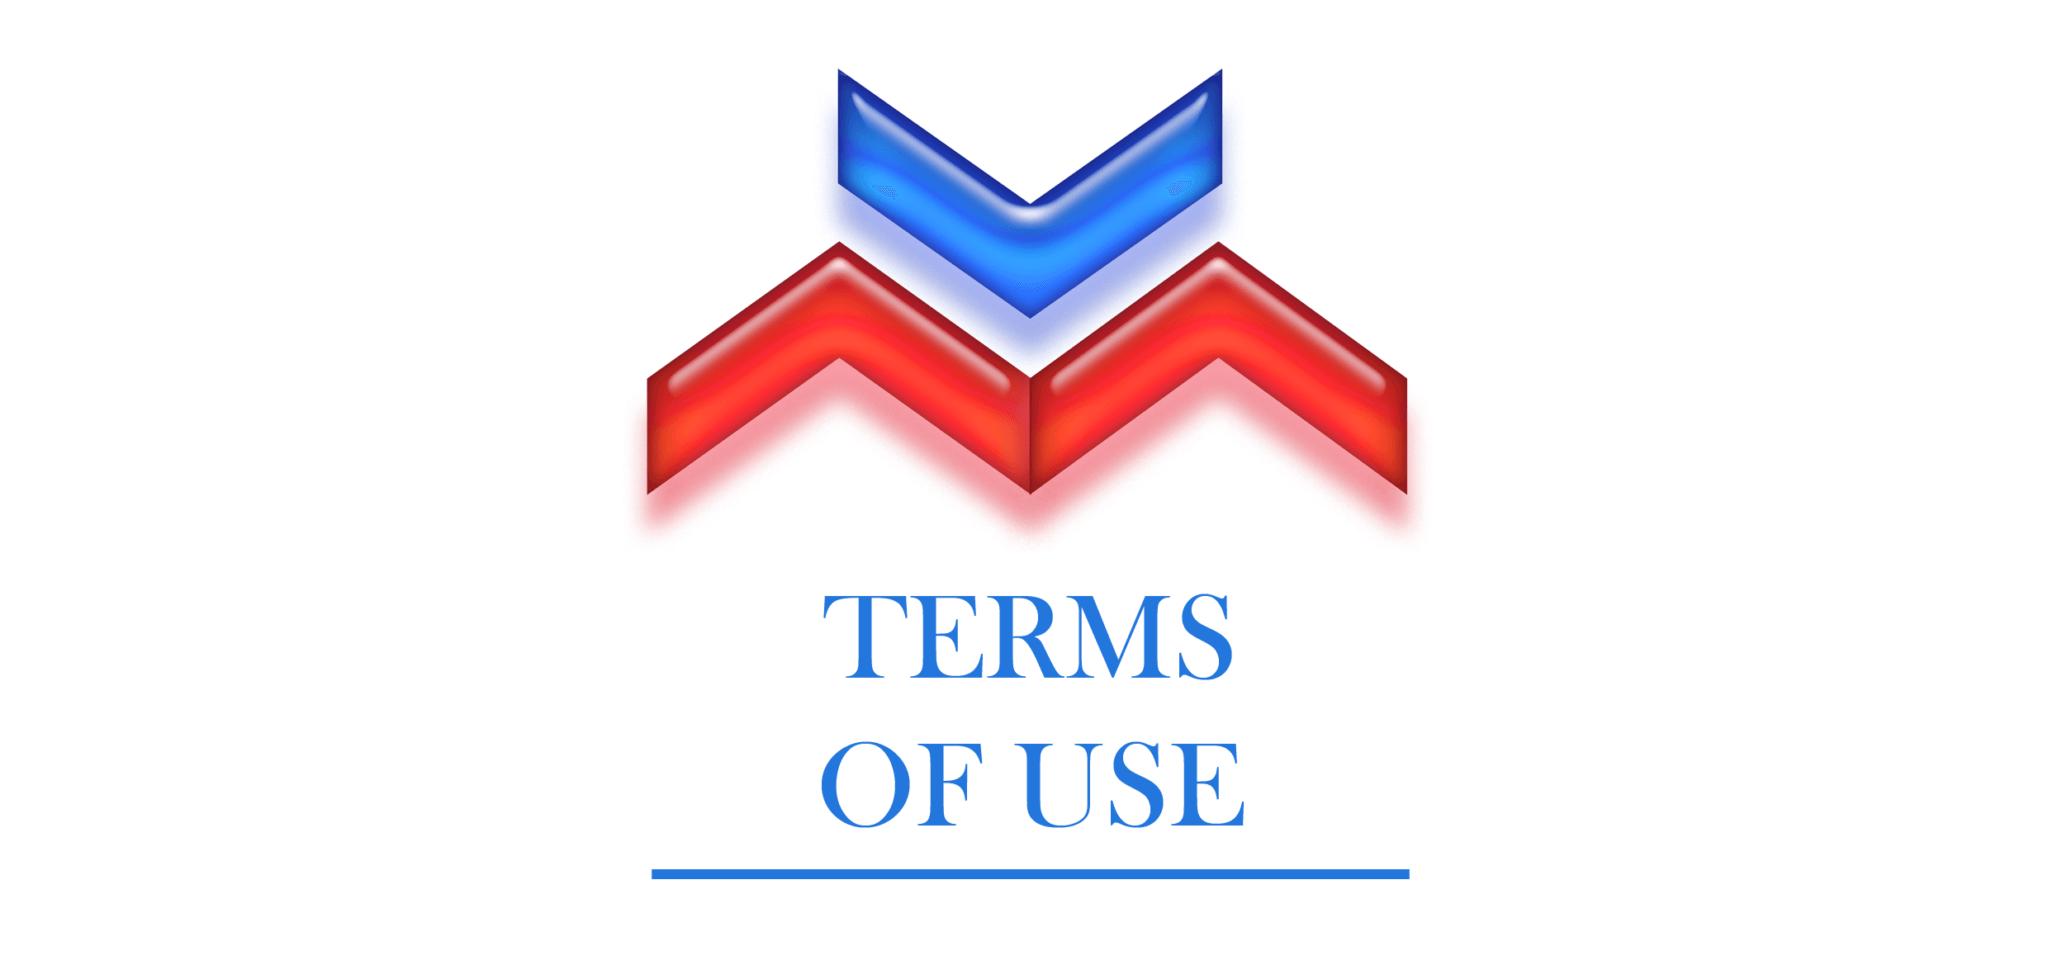 Matrix Development - Terms of Use